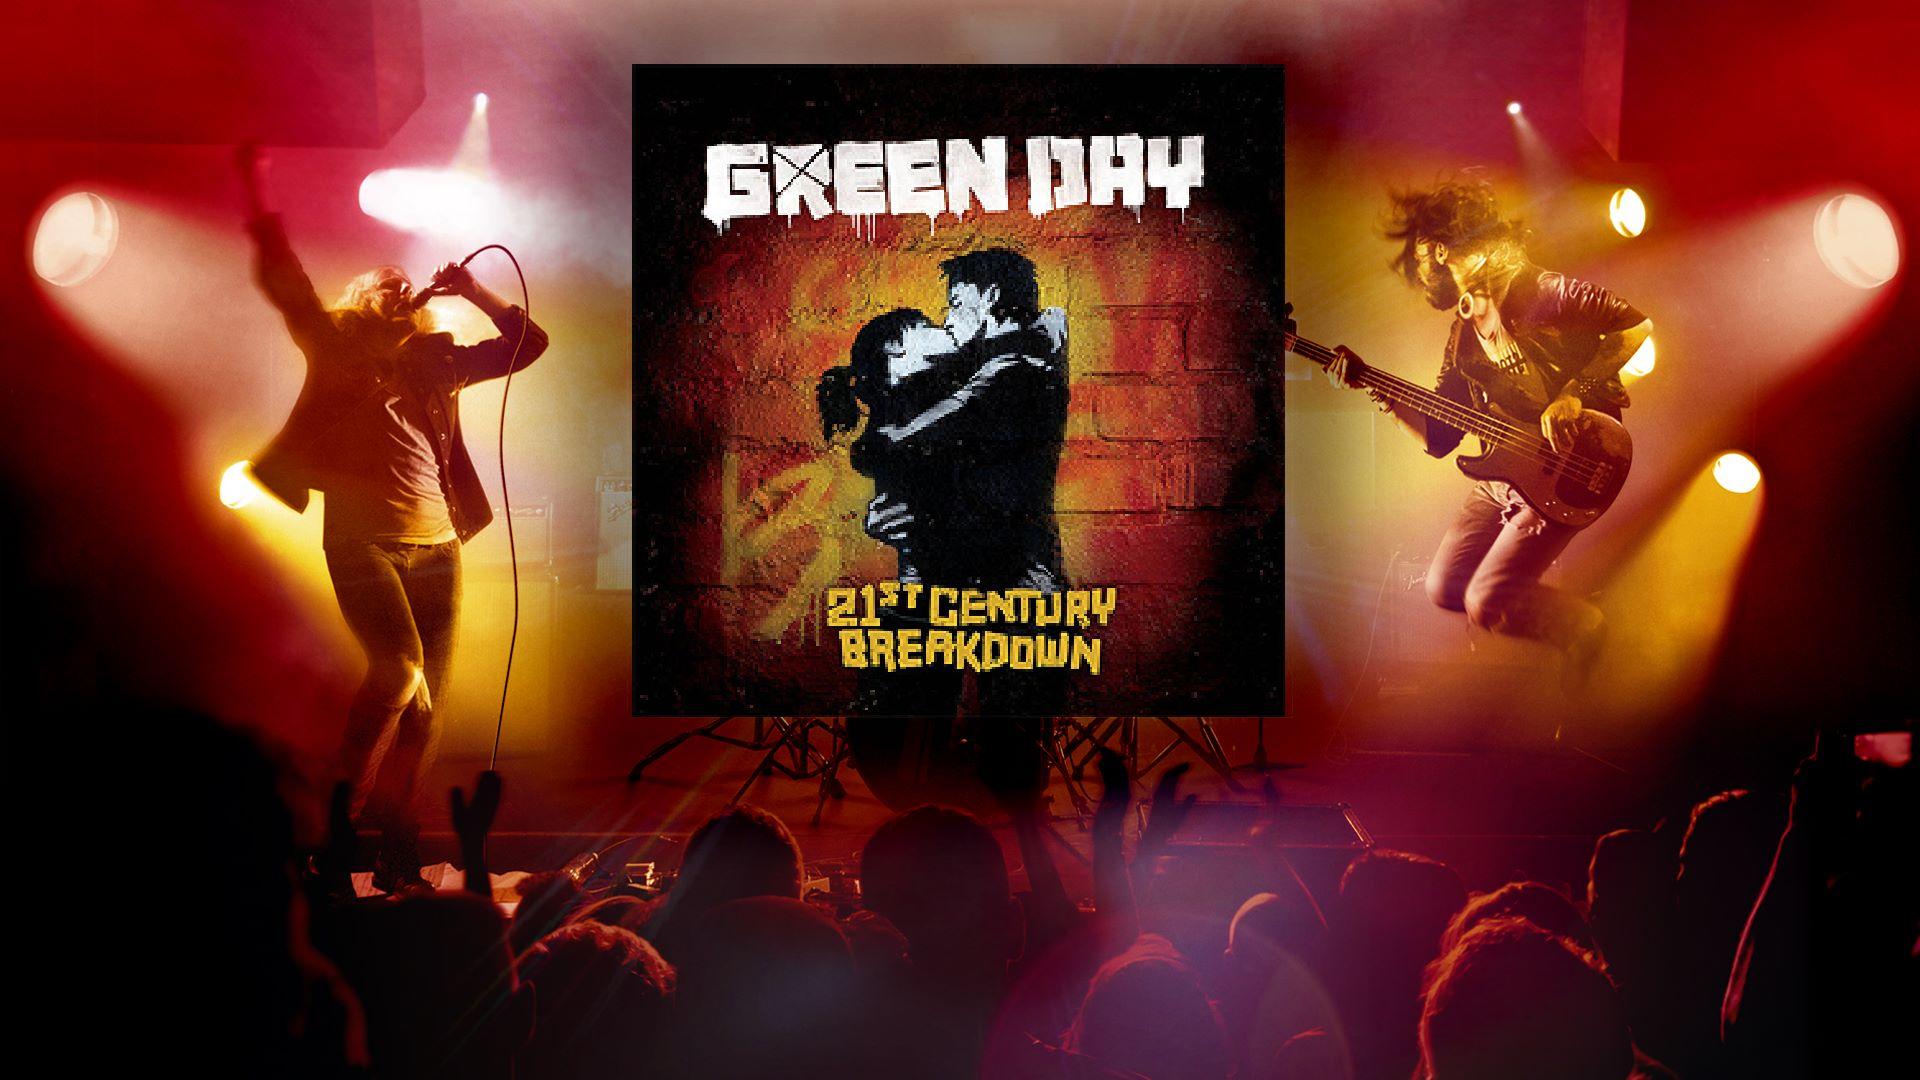 21st Century Breakdown (Album)21st Century Breakdown (Album)21st Century Breakdown (Album)Published byDeveloped byRelease dateApproximate sizeAge ratingCategoryIn-app purchasesAdditional terms